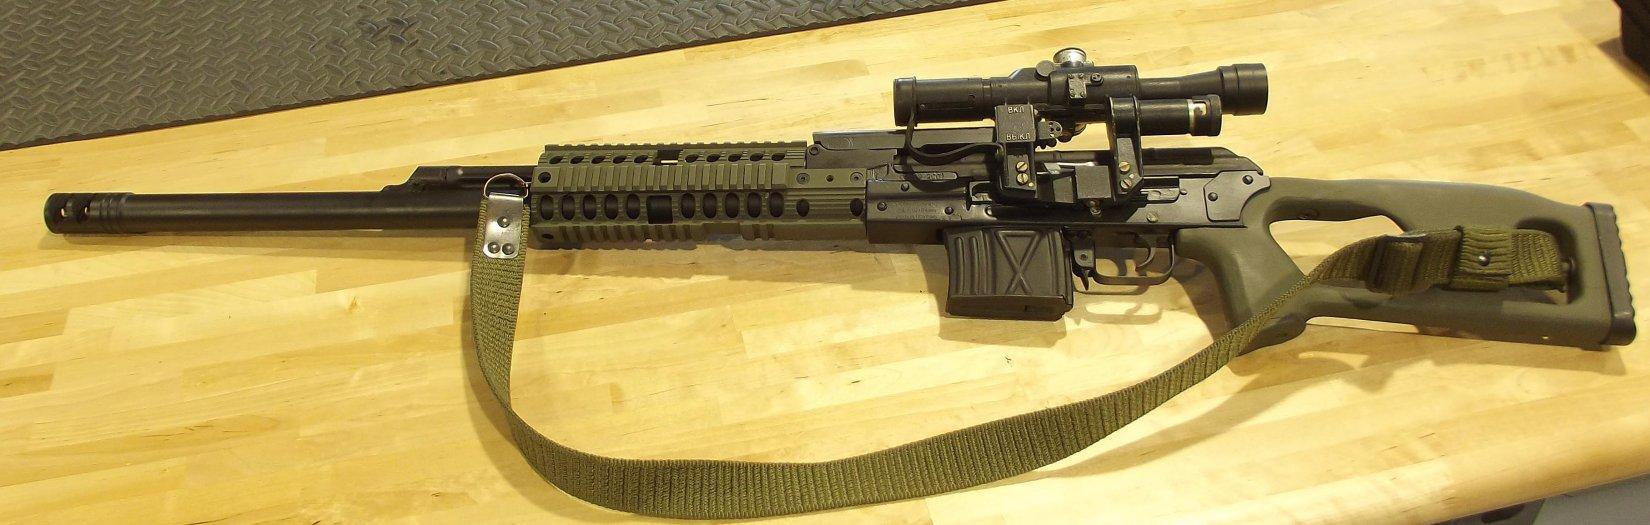 Teludyne Tech Industries (TTI) StraightJacket Barrel System Turns Tactical Kalashnikov AK/AKM Rifle/Carbine into Precision Weapon!